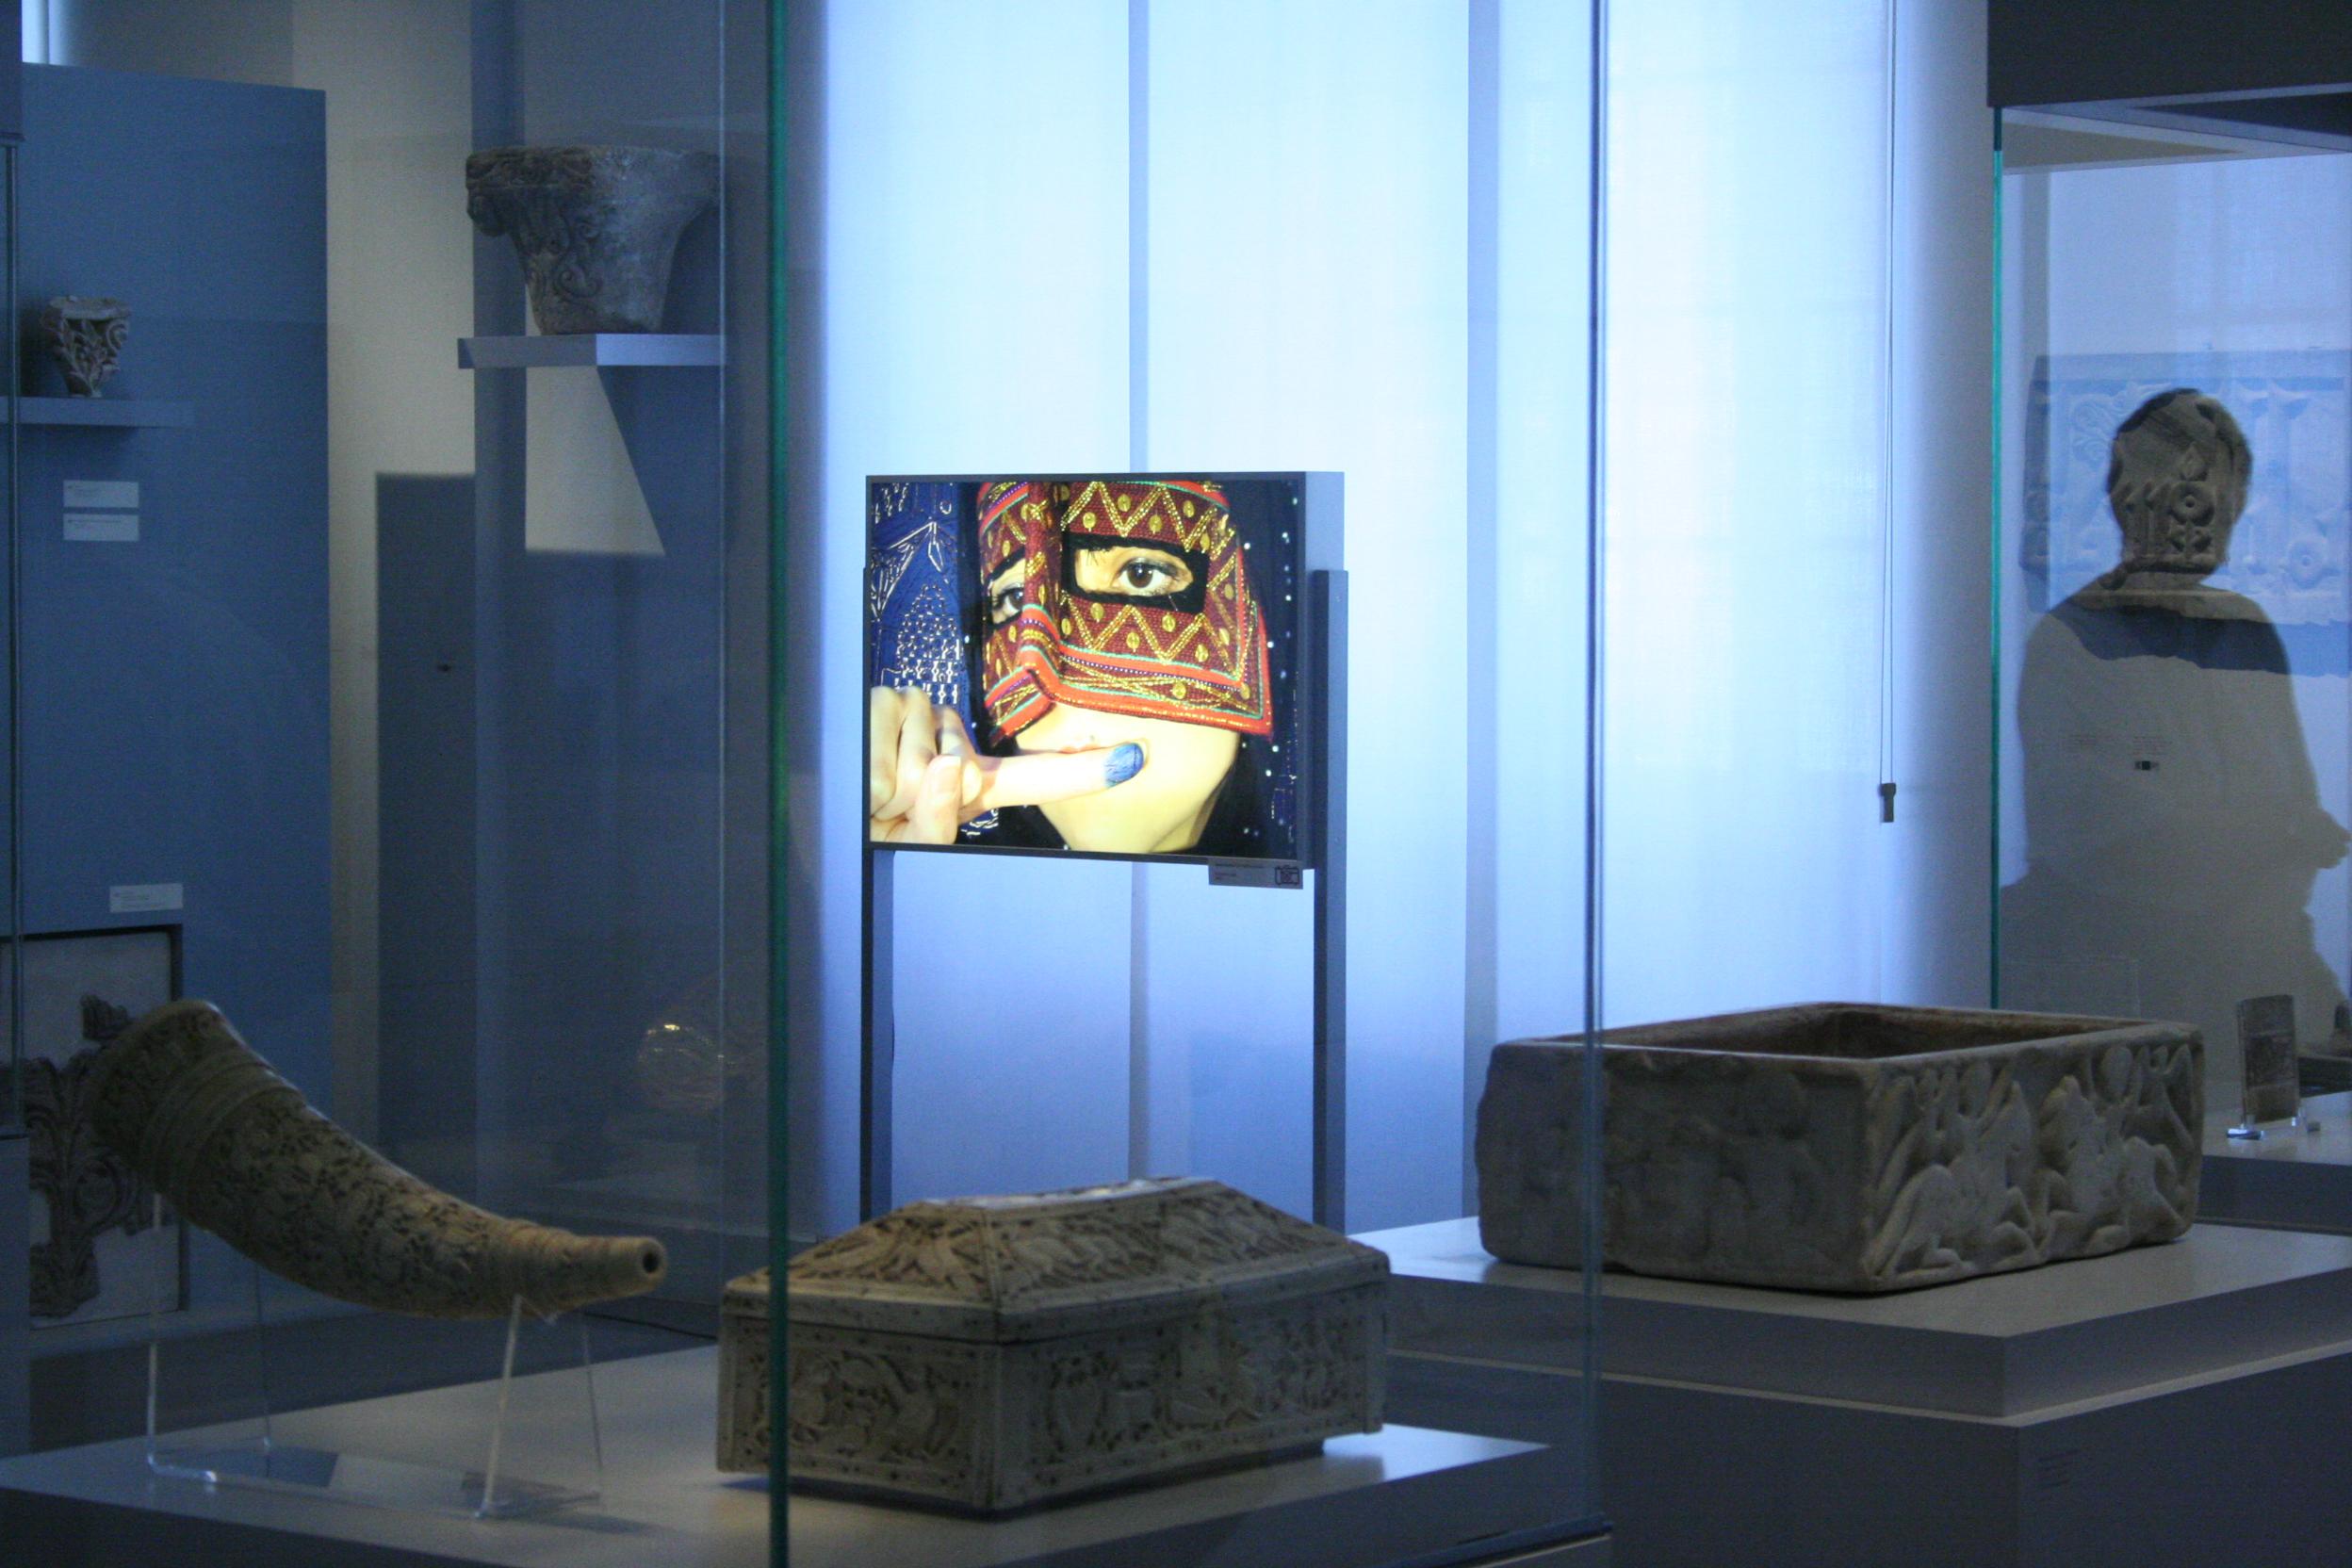 Tuba, PergamonMuseum, Berlin, Germany, 2007